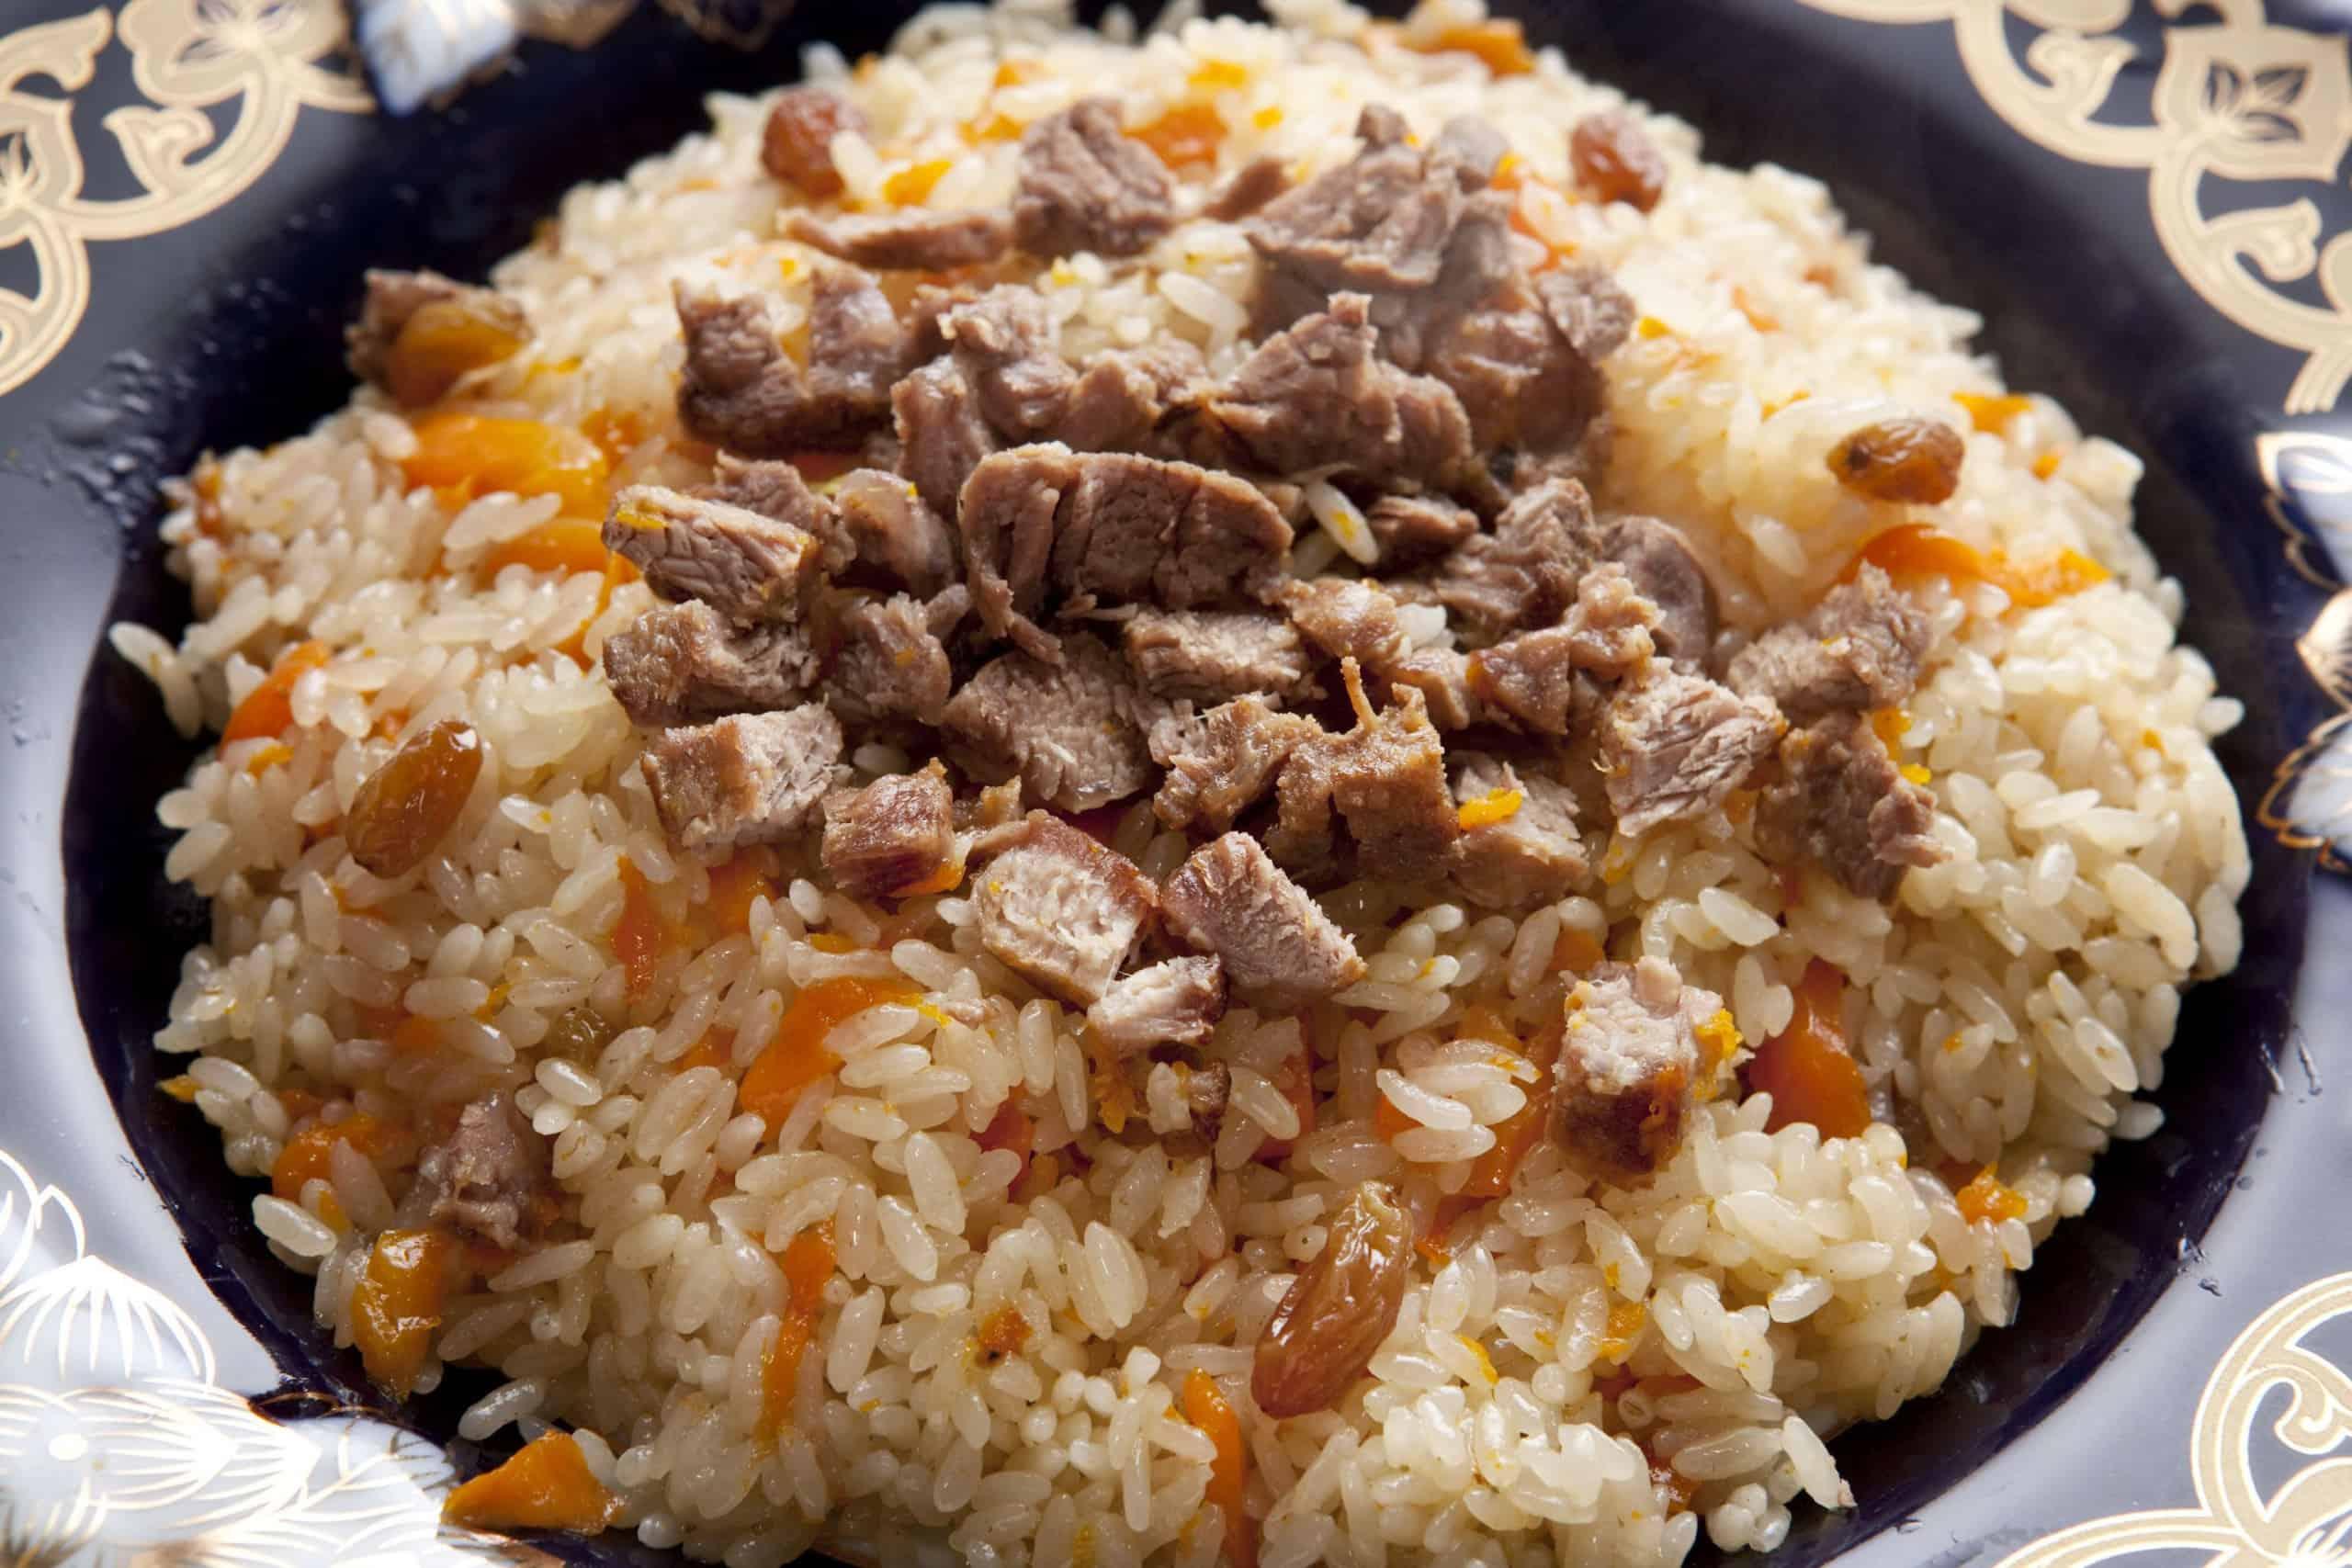 Turkmen Cuisine